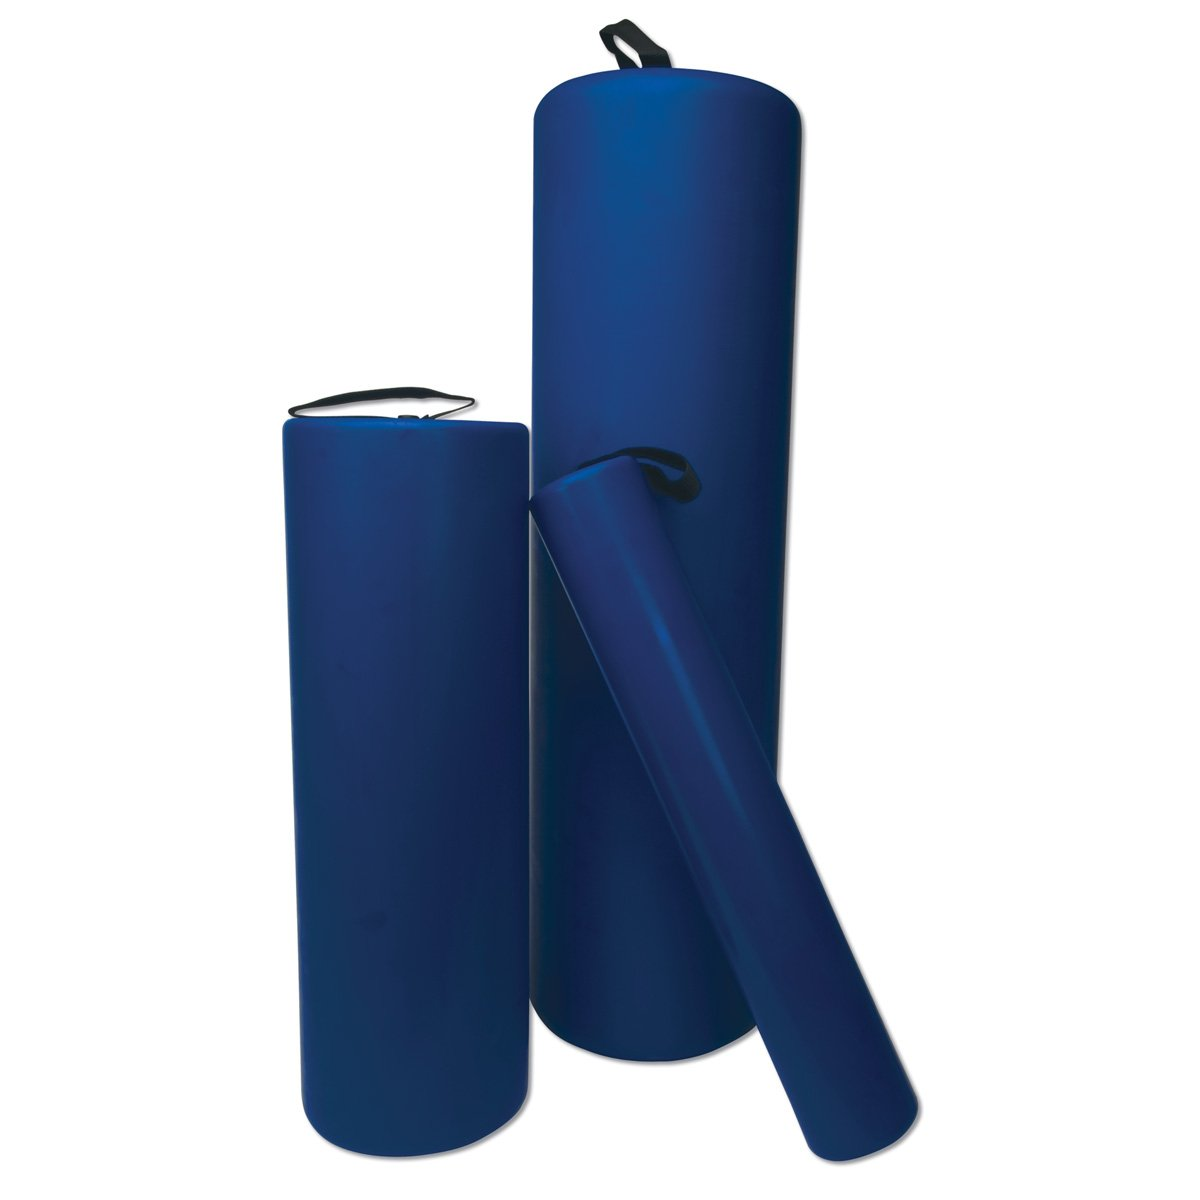 Skillbuilders 30-1003 Positioning Roll, 8'' x 36'' by Skillbuilders